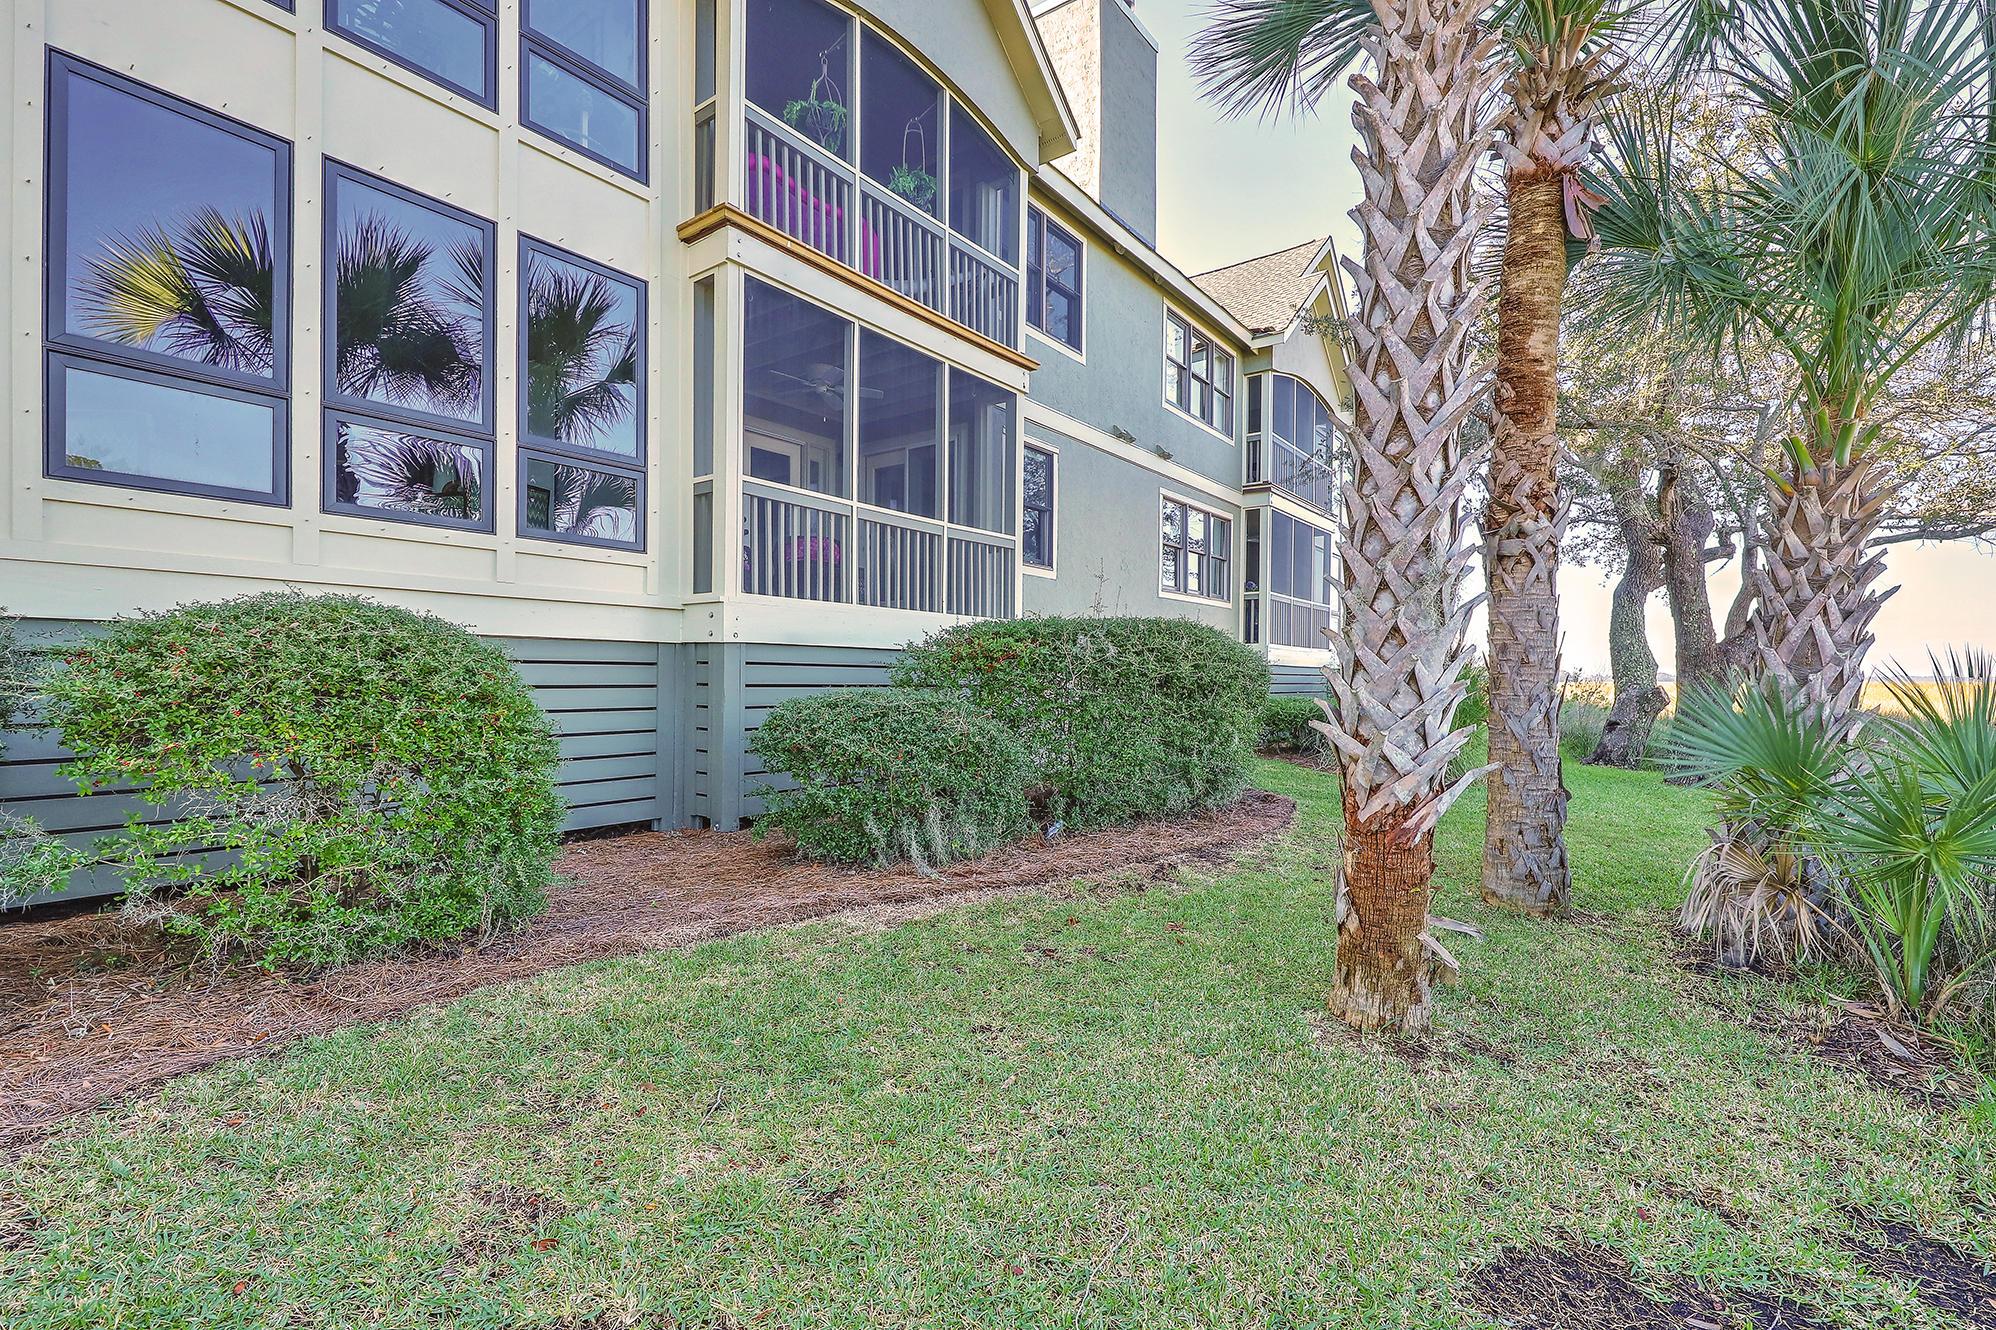 Seabrook Island Homes For Sale - 2103 Landfall, Johns Island, SC - 25